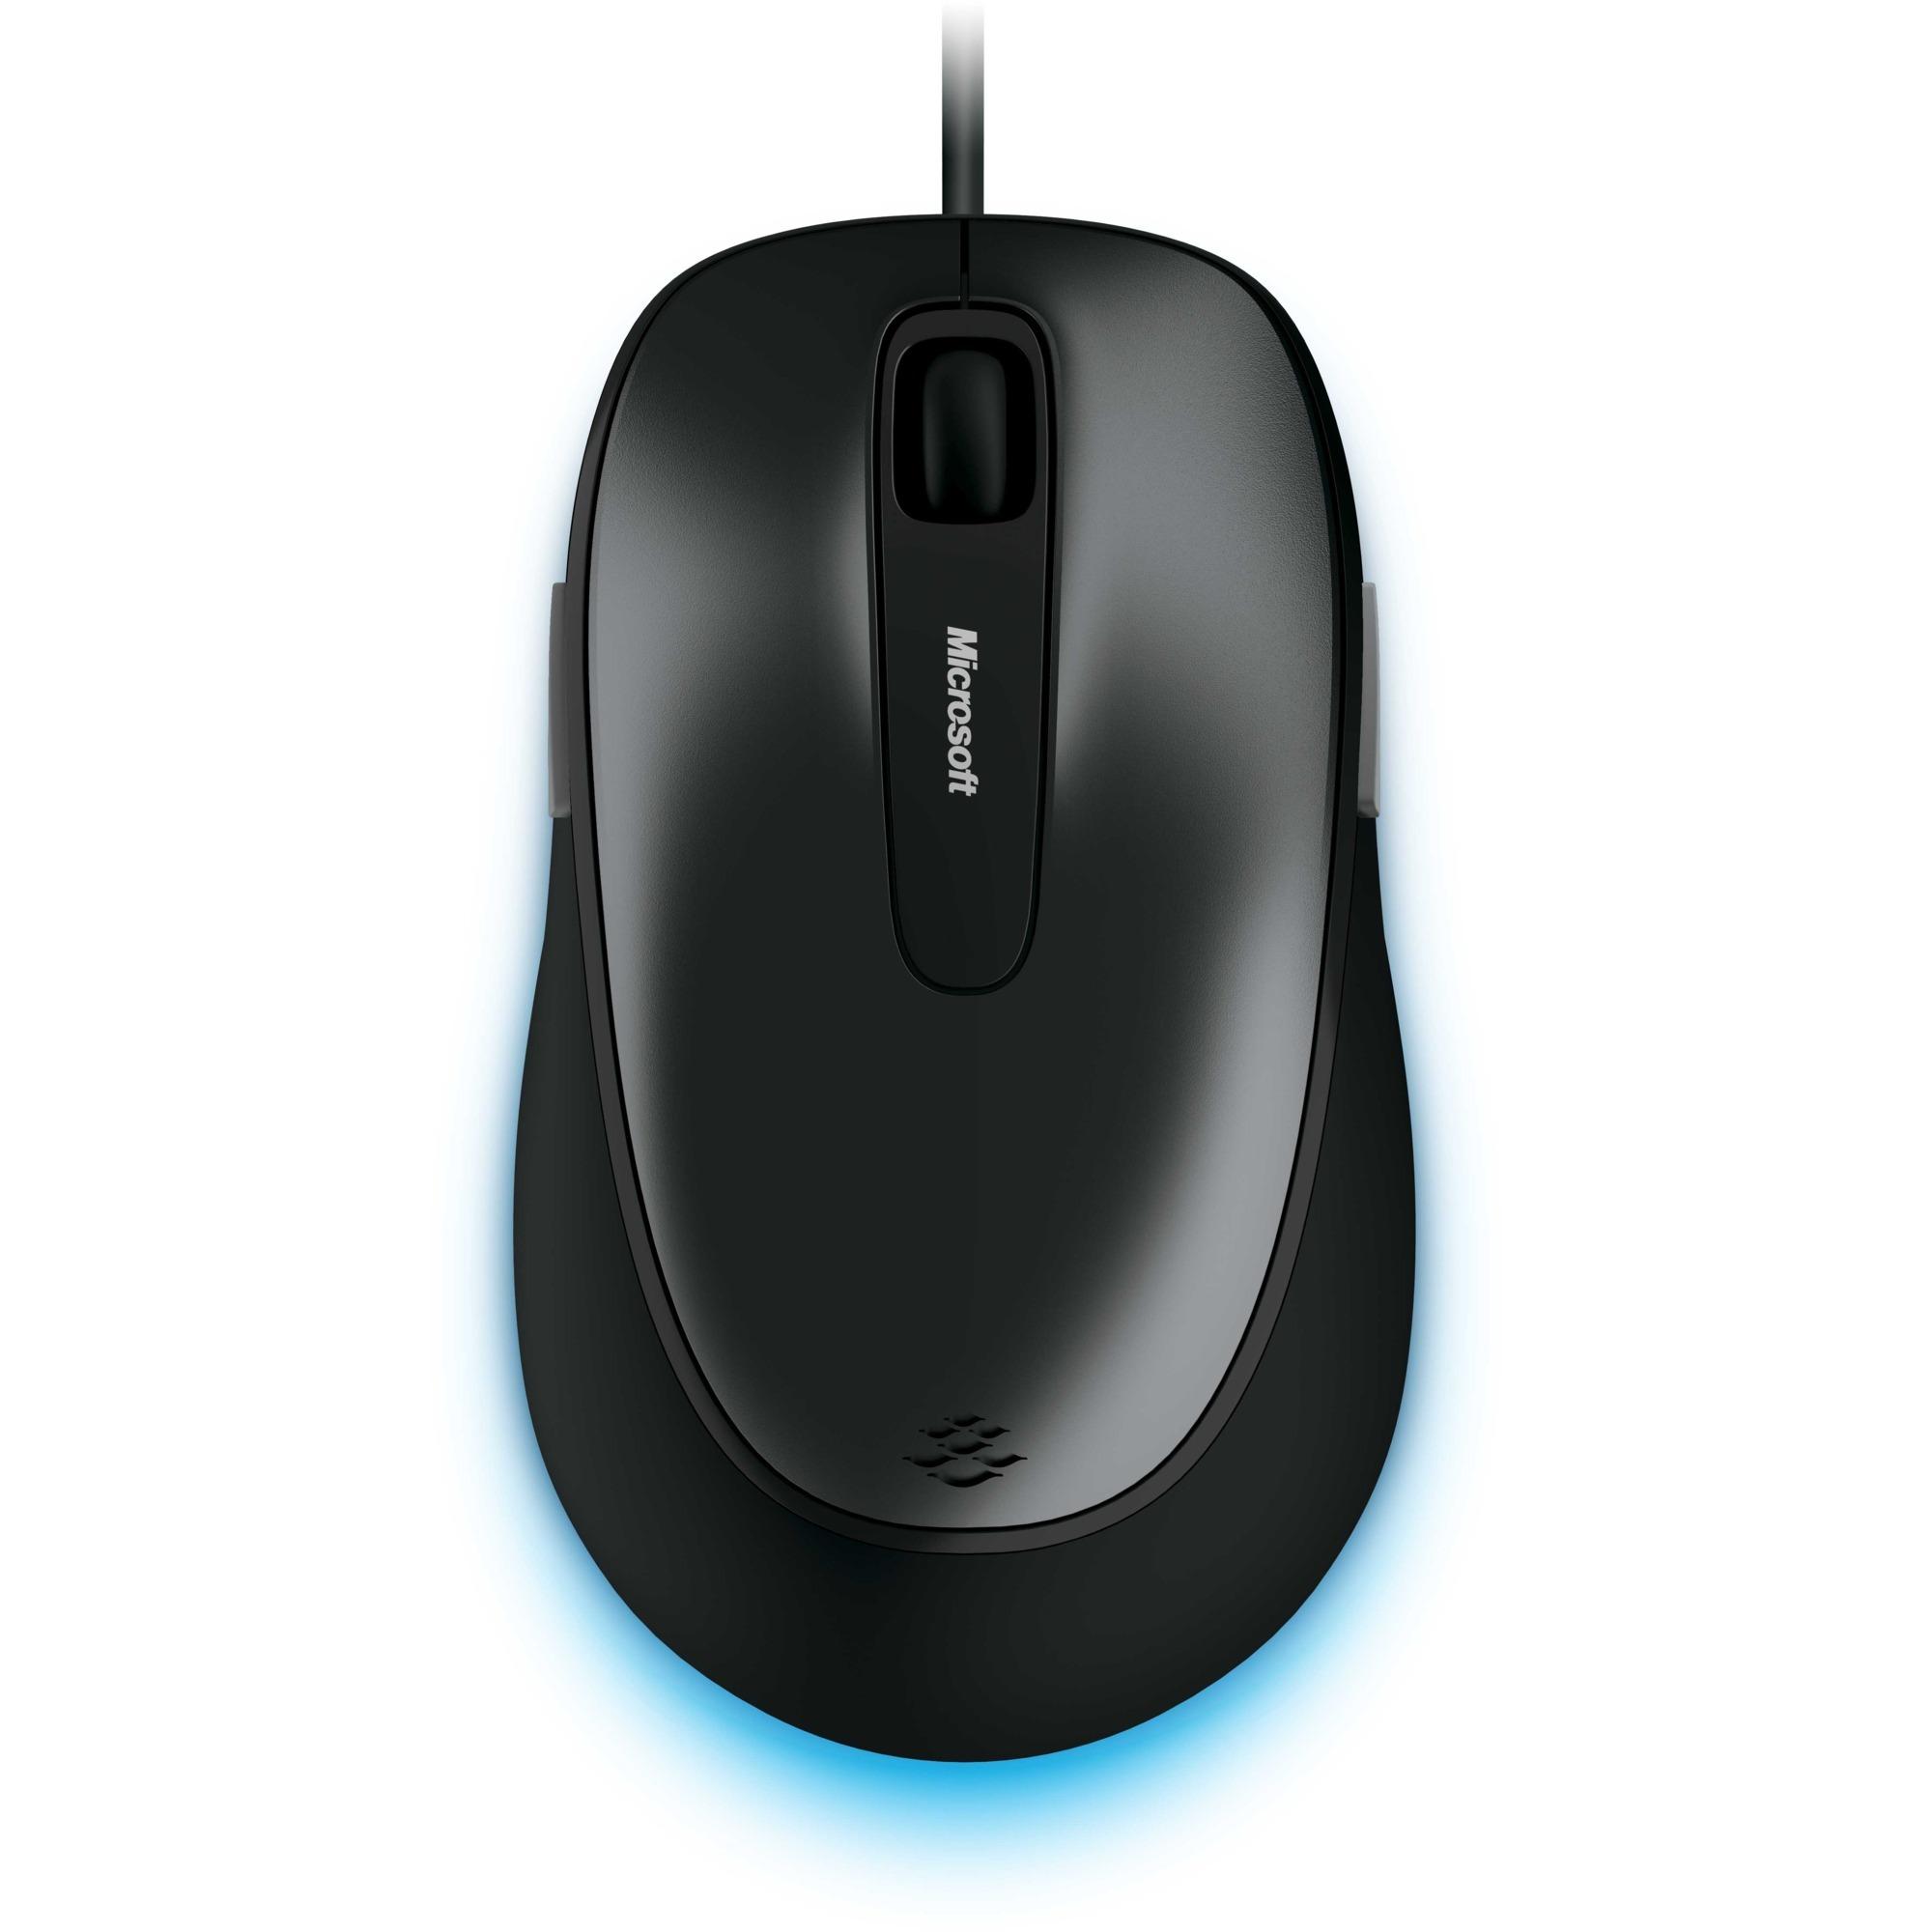 Comfort Mouse 4500 USB Óptico 1000DPI Ambidextro Negro ratón